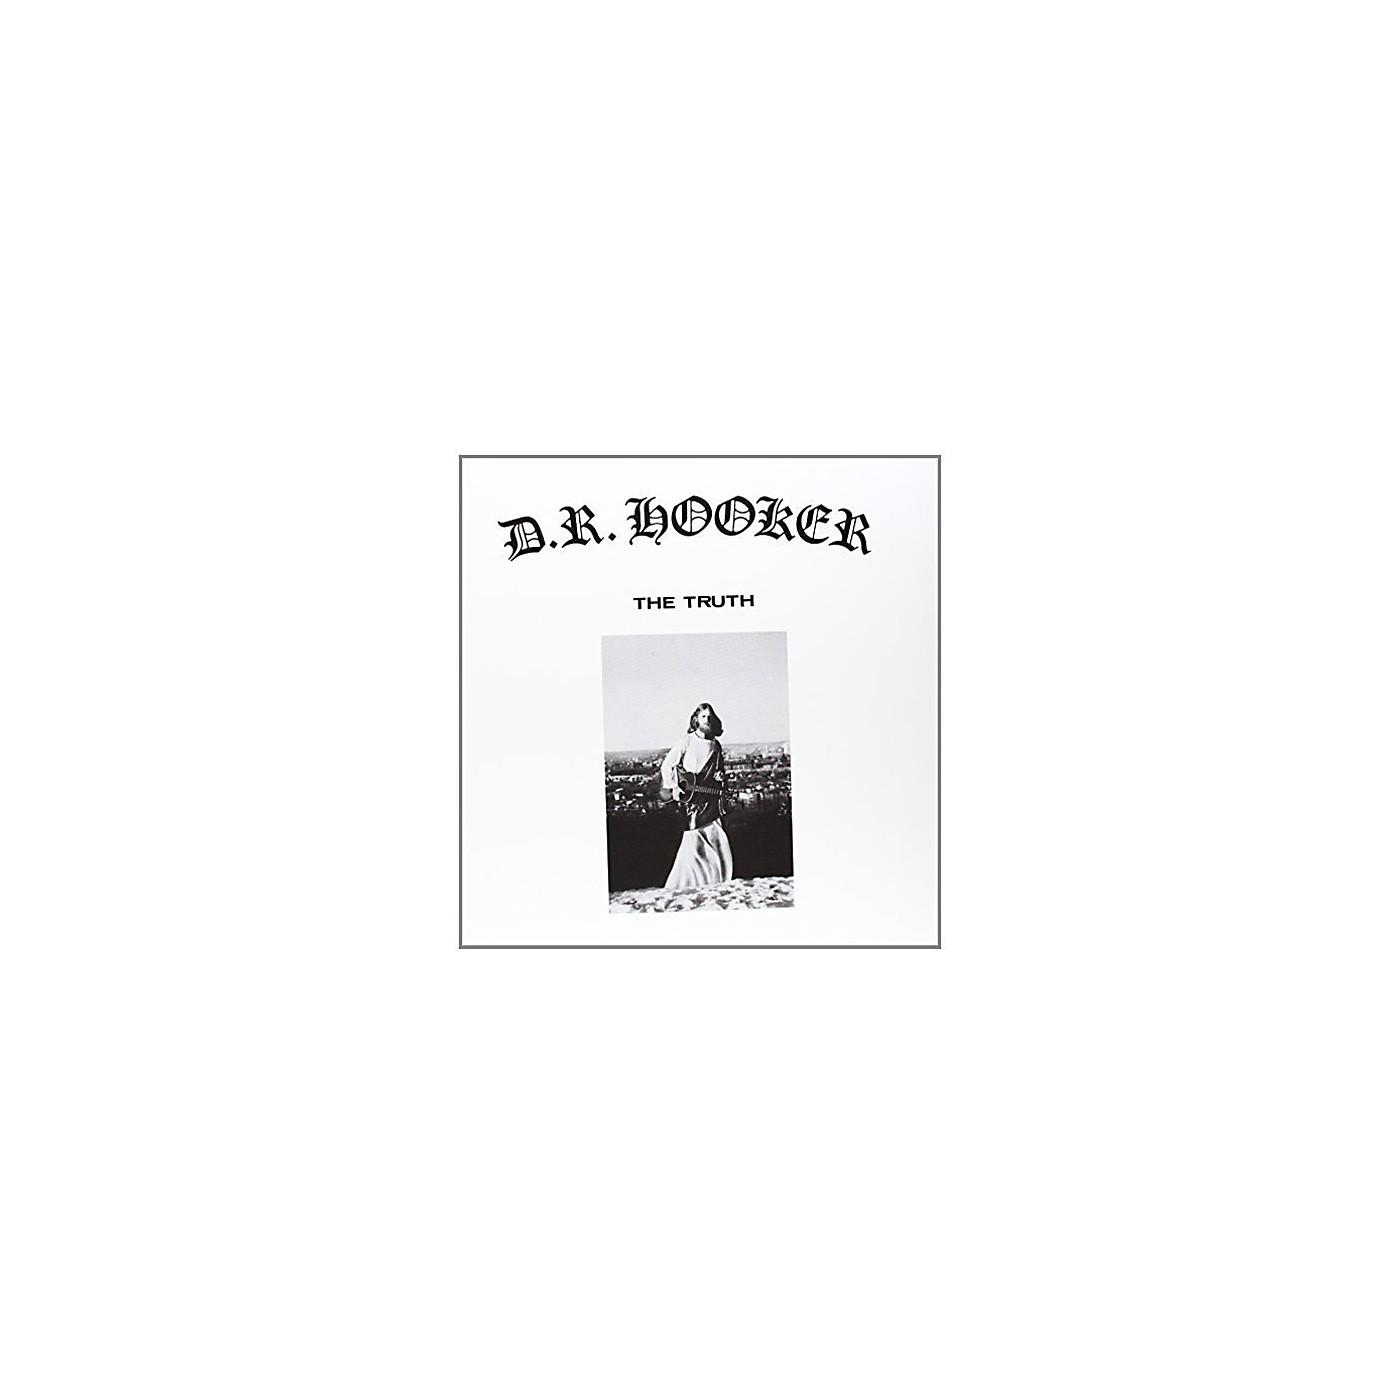 Alliance D.R. Hooker - The Truth thumbnail